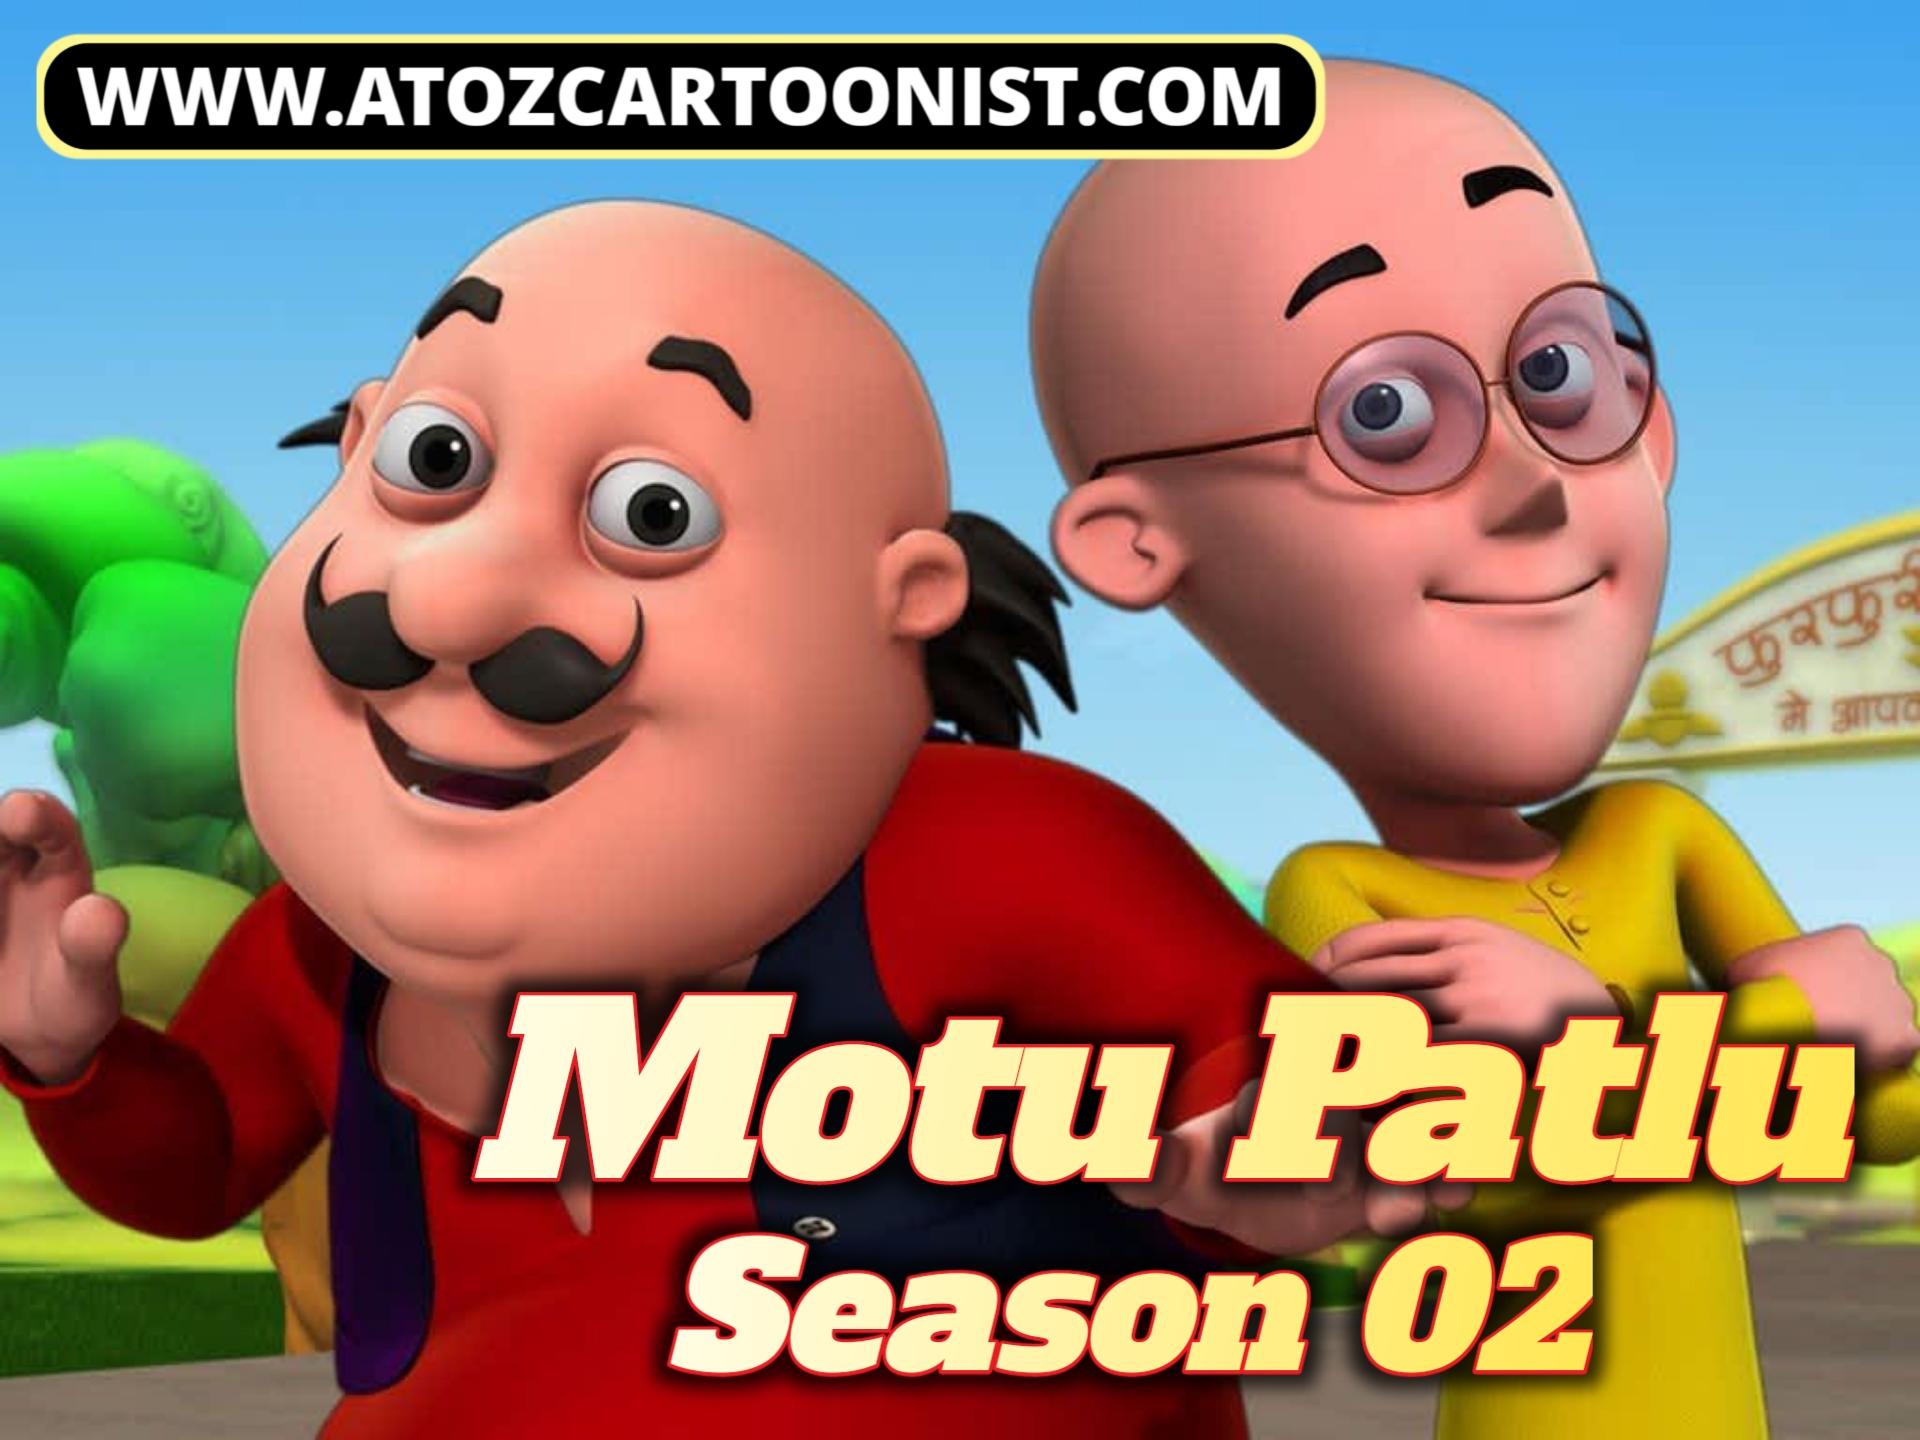 MOTU PATLU SEASON 02 ALL EPISODES IN HINDI